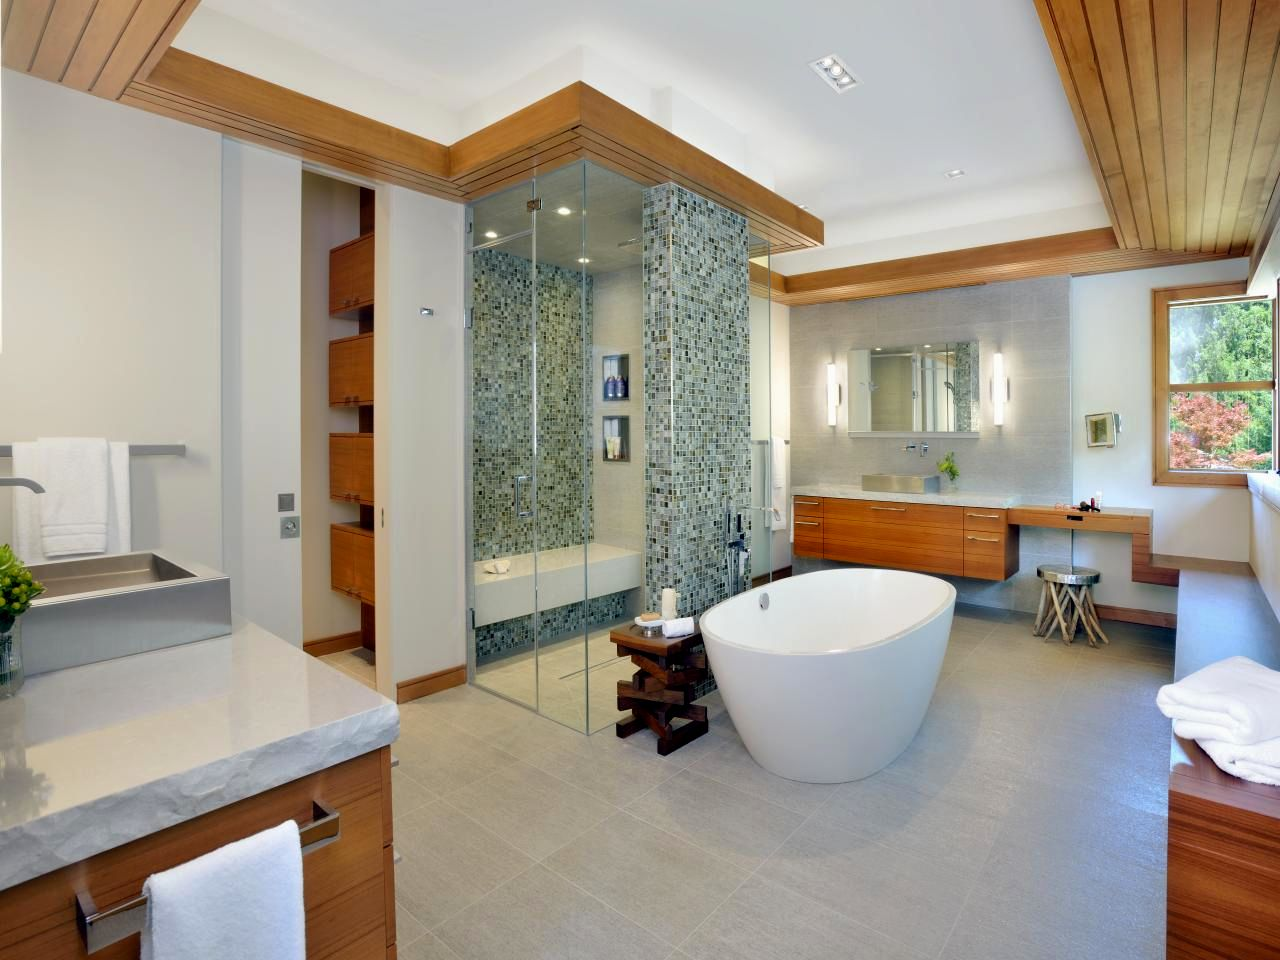 best furniture bathroom vanity layout-Amazing Furniture Bathroom Vanity Concept